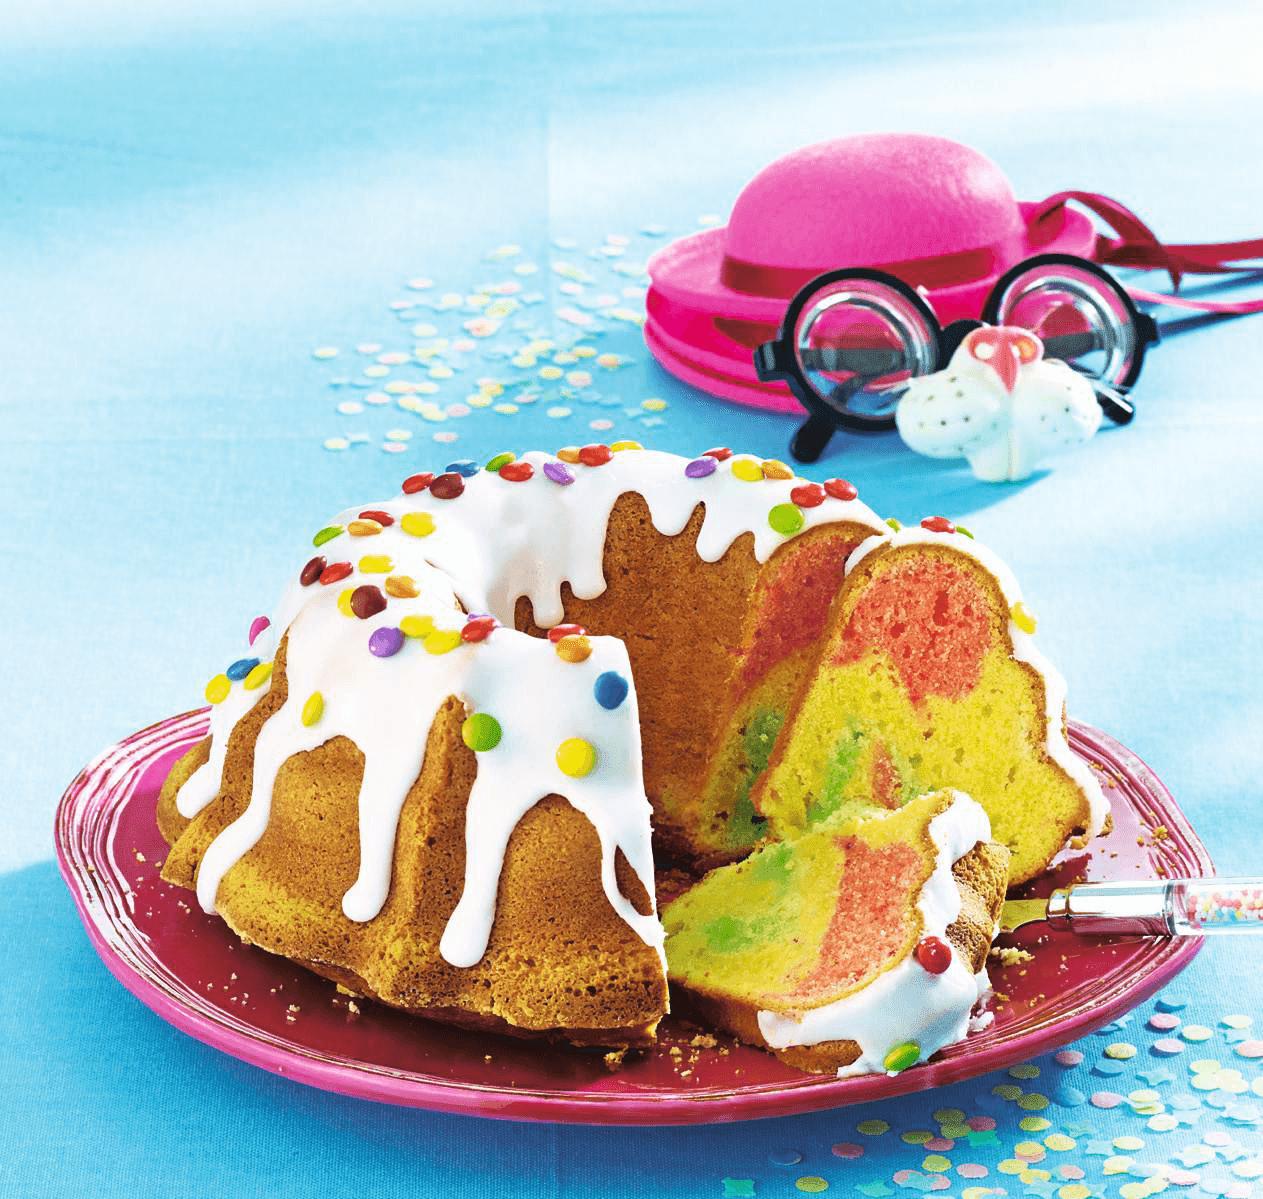 Recette du rainbow cake facile